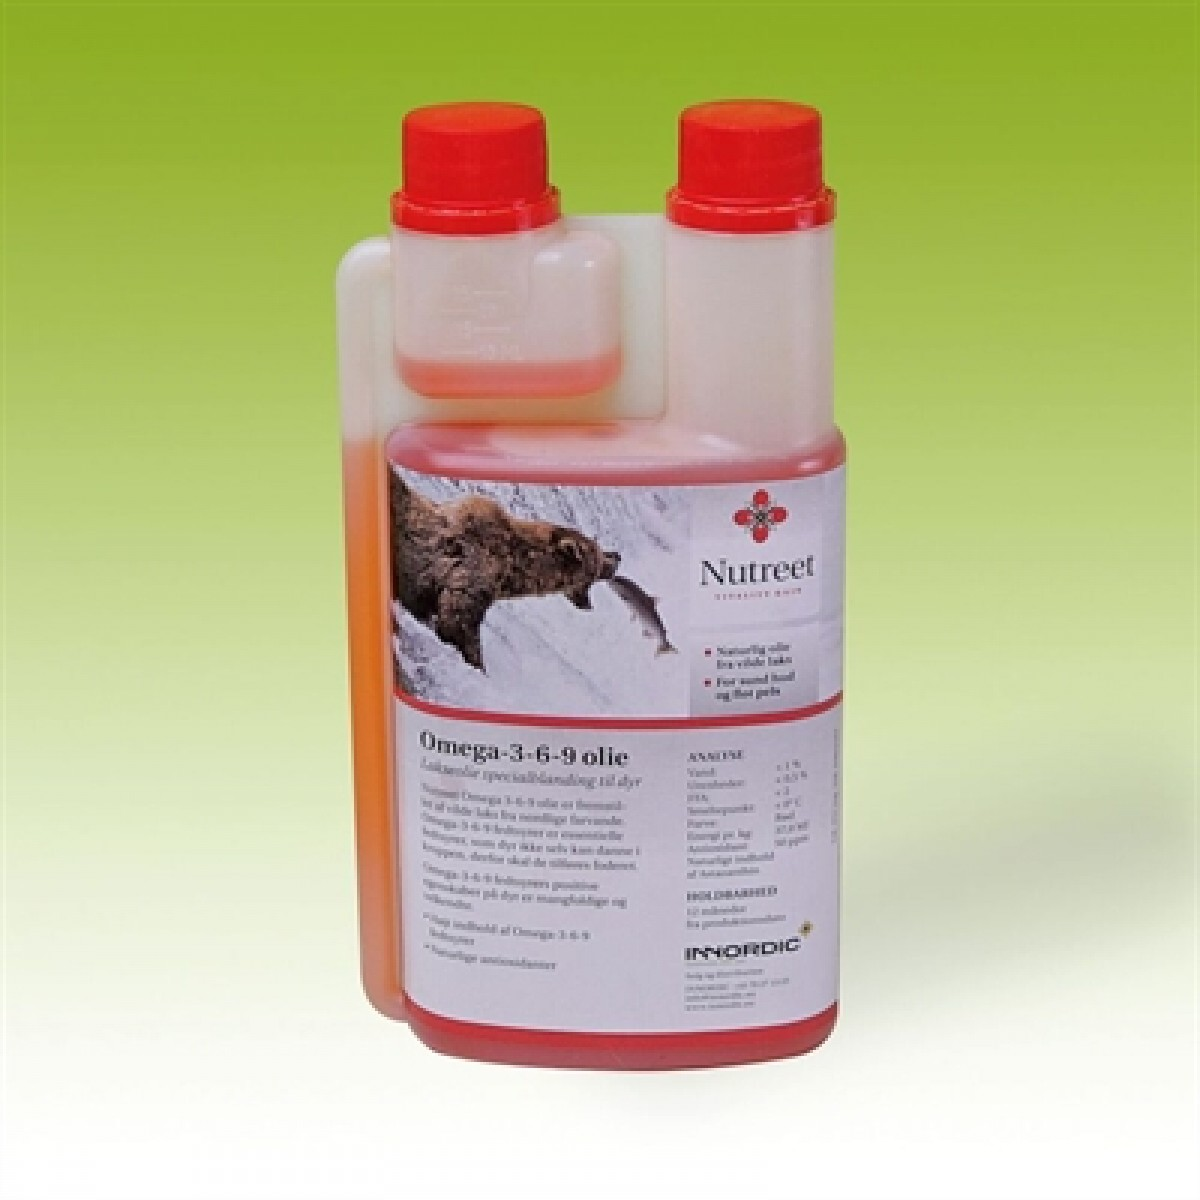 Nutreet Omega 3-6-9 Lakseolie 1 L